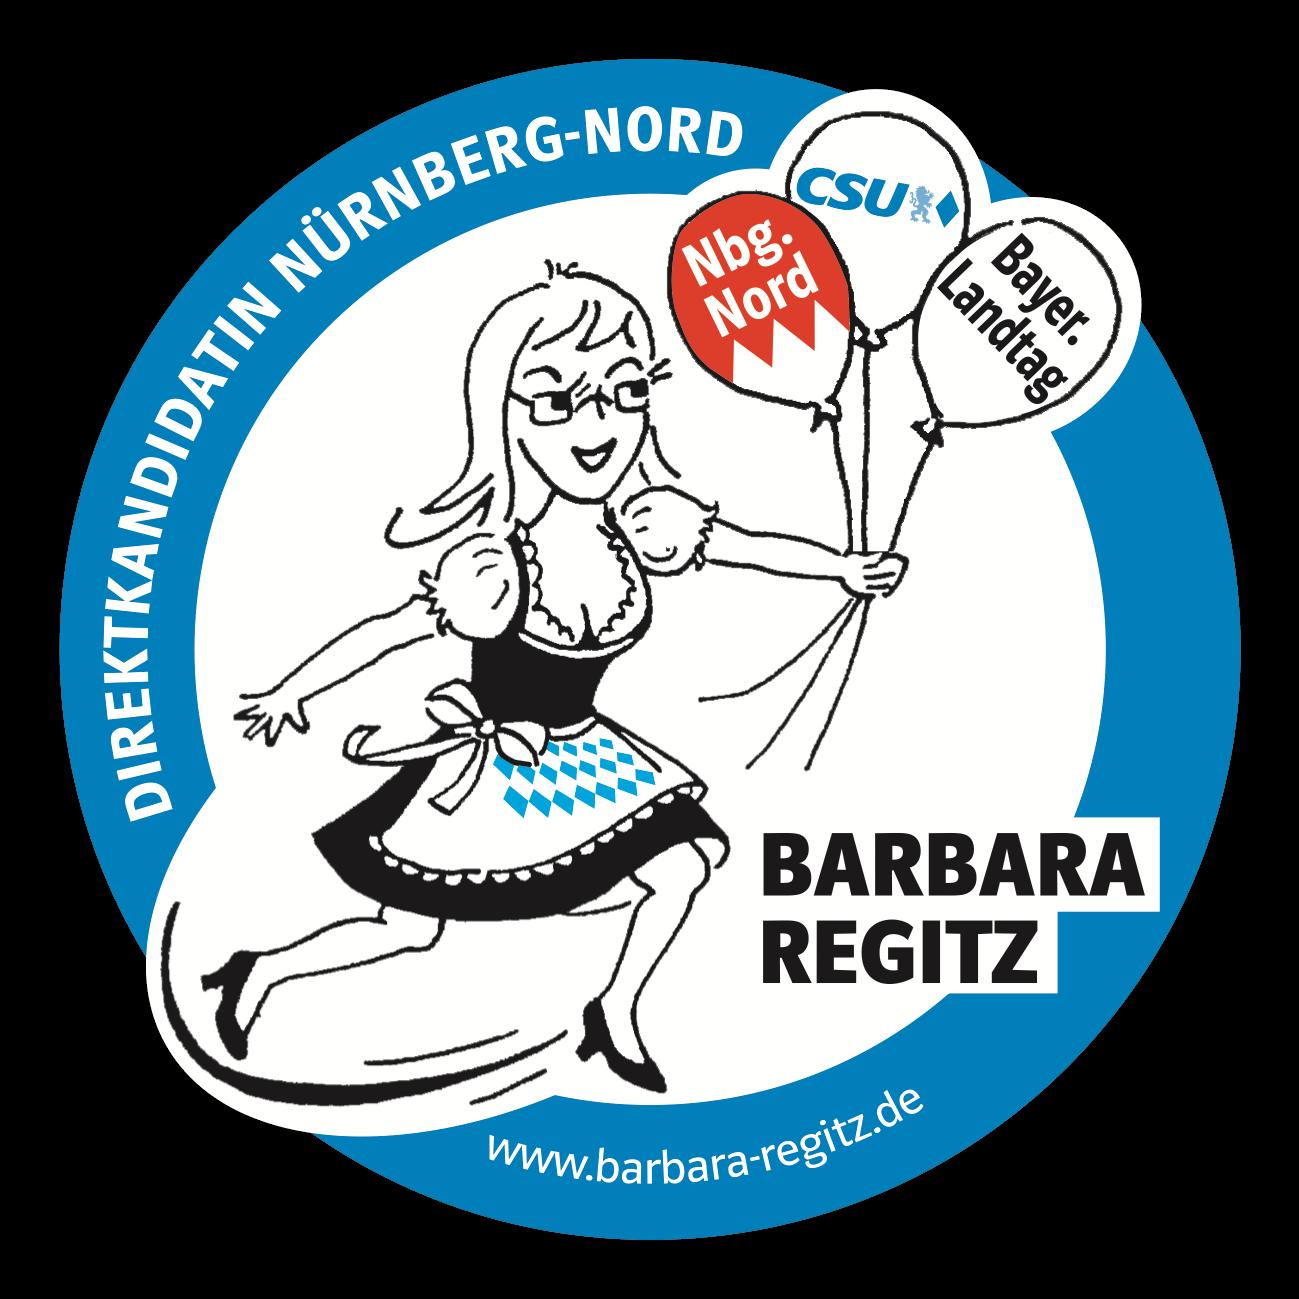 Barbara Regitz, Direktkandidatin Nürnberg Nord, Landtagswahl 2018, Bierdeckel